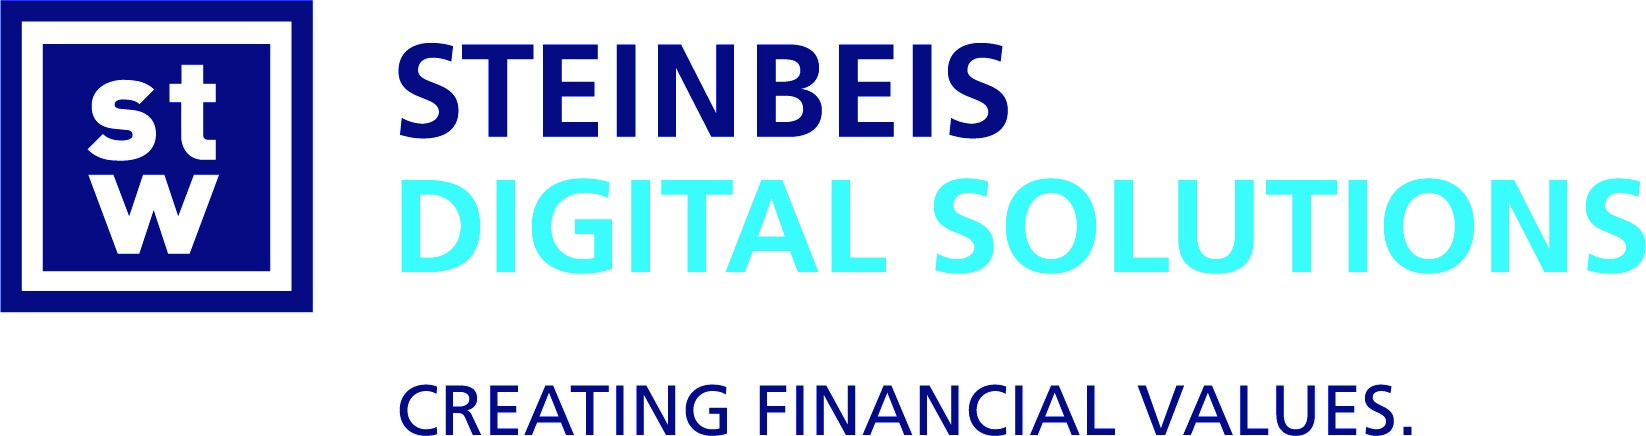 Steinbeis_DigitalSolutions_Logo